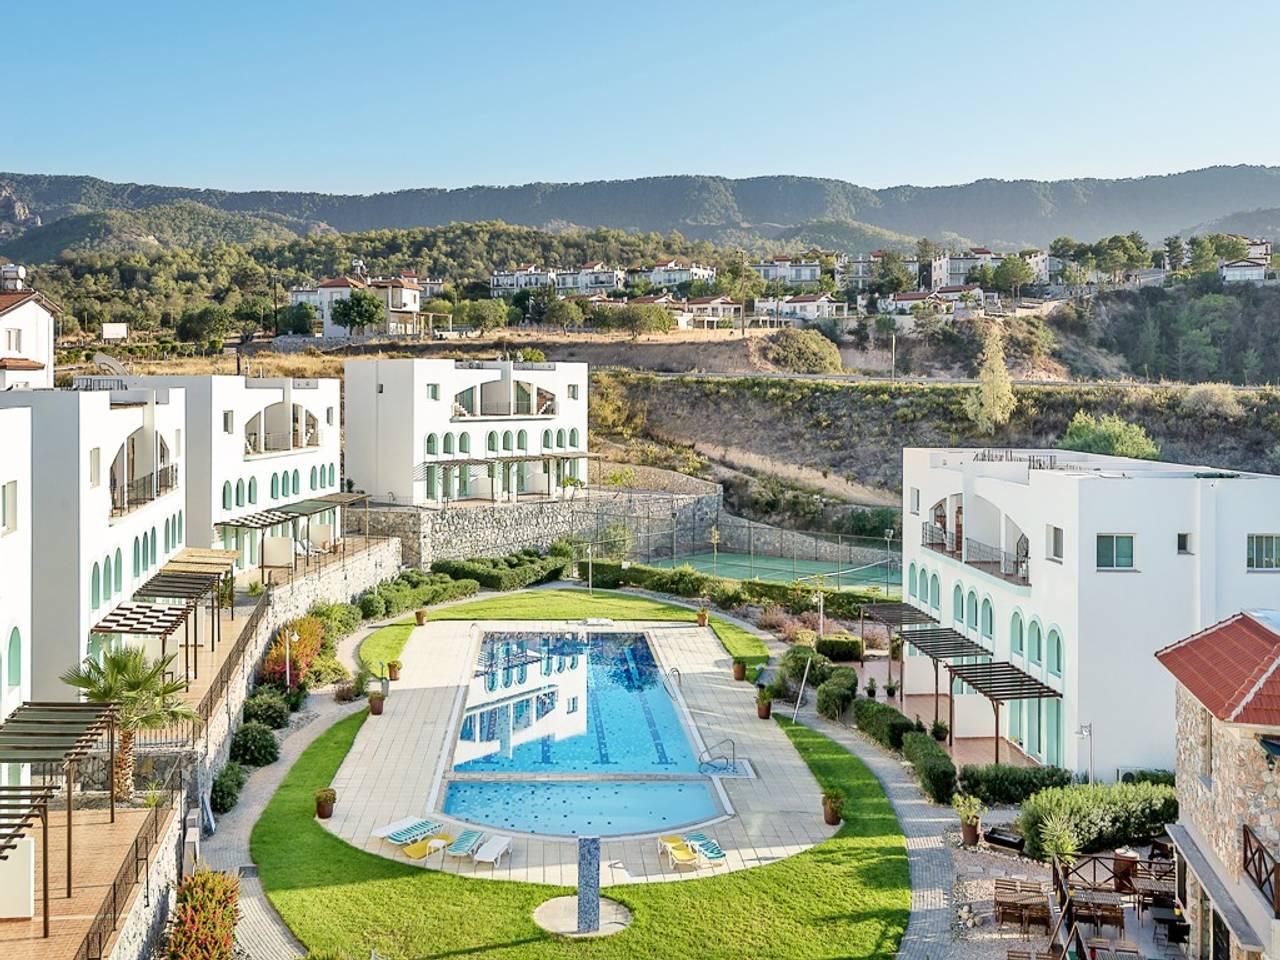 Apartment Joya Cyprus Nightingale Garden Apartment photo 28576318